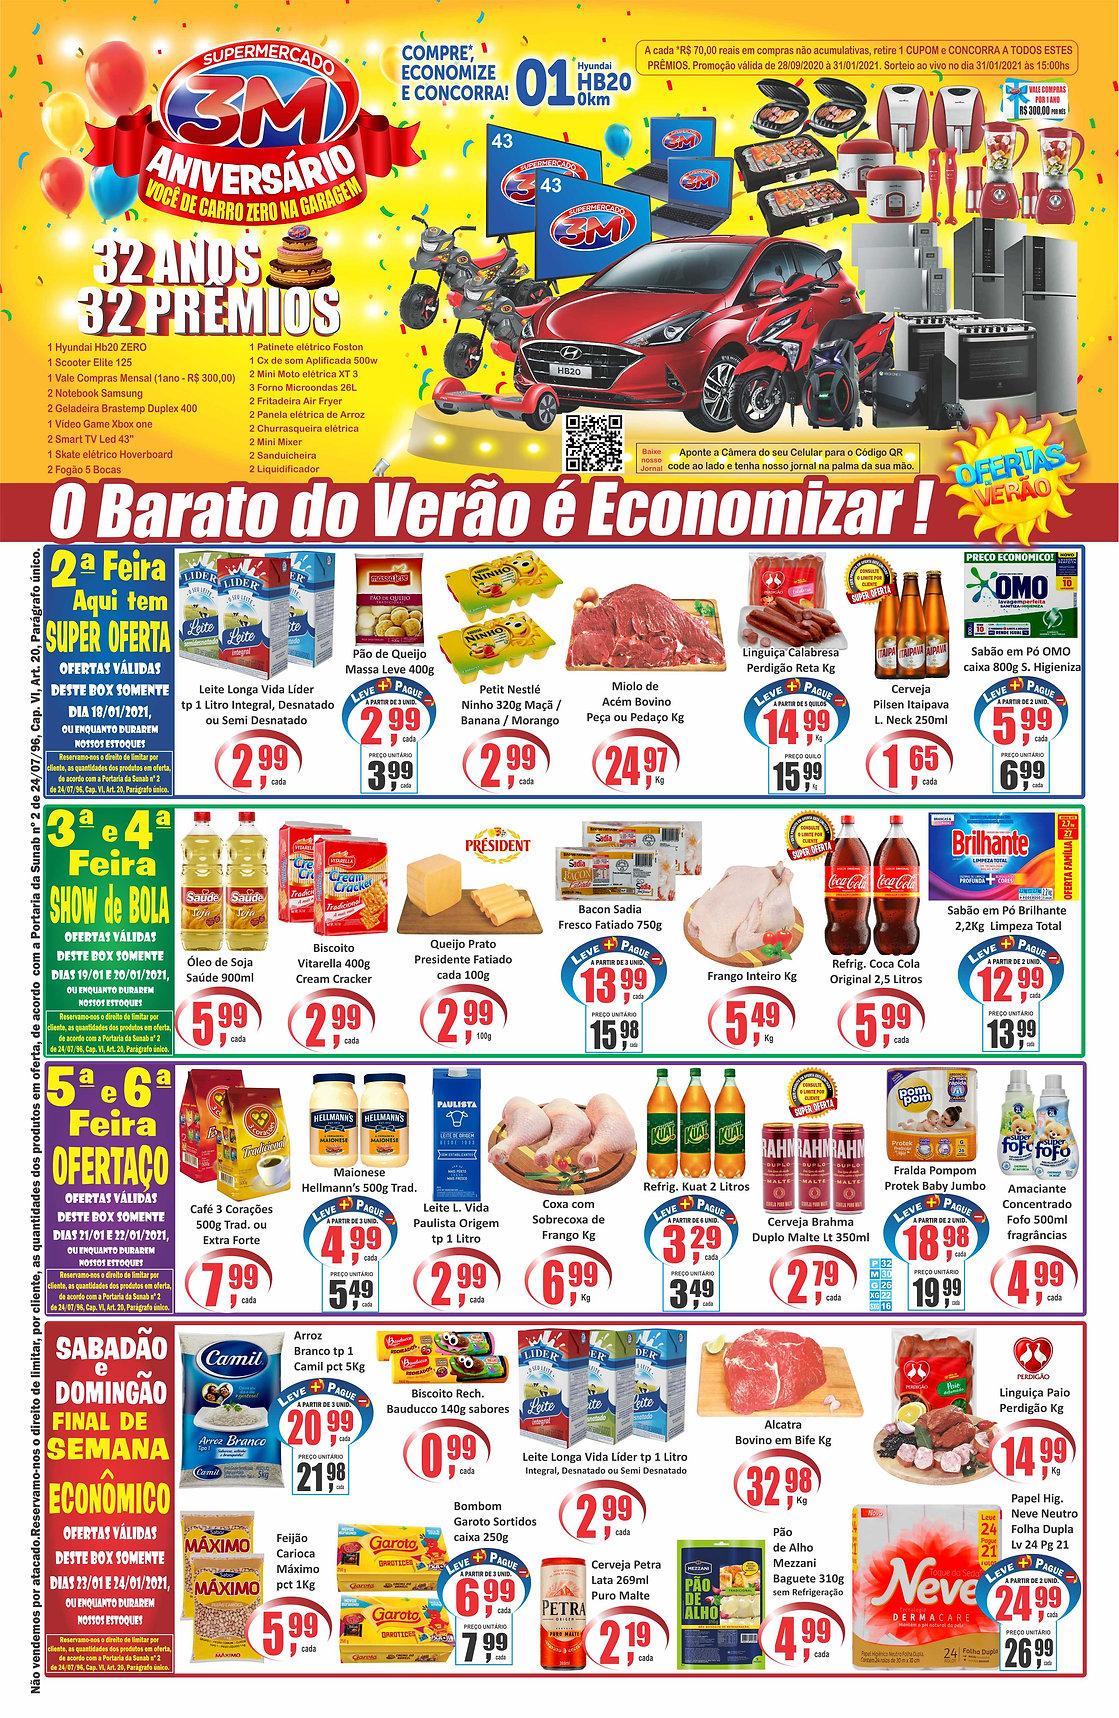 SUPERMERCADO 3M CAPA (3).jpg